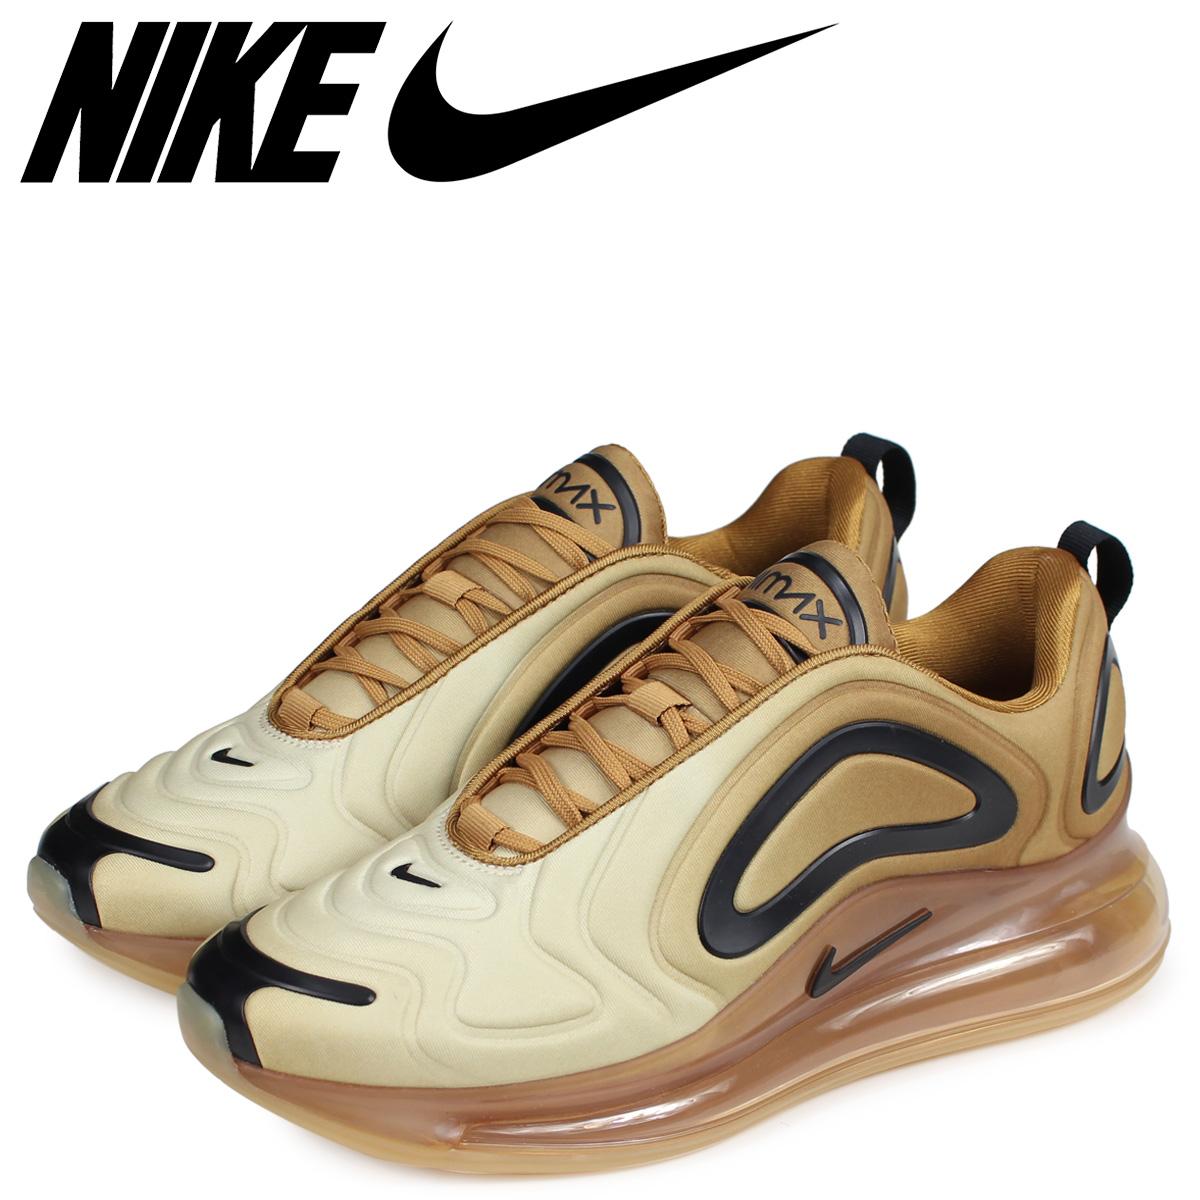 cheap for discount 3df8e fb133 NIKE Kie Ney AMAX 720 sneakers men AIR MAX 720 gold AO2924-700